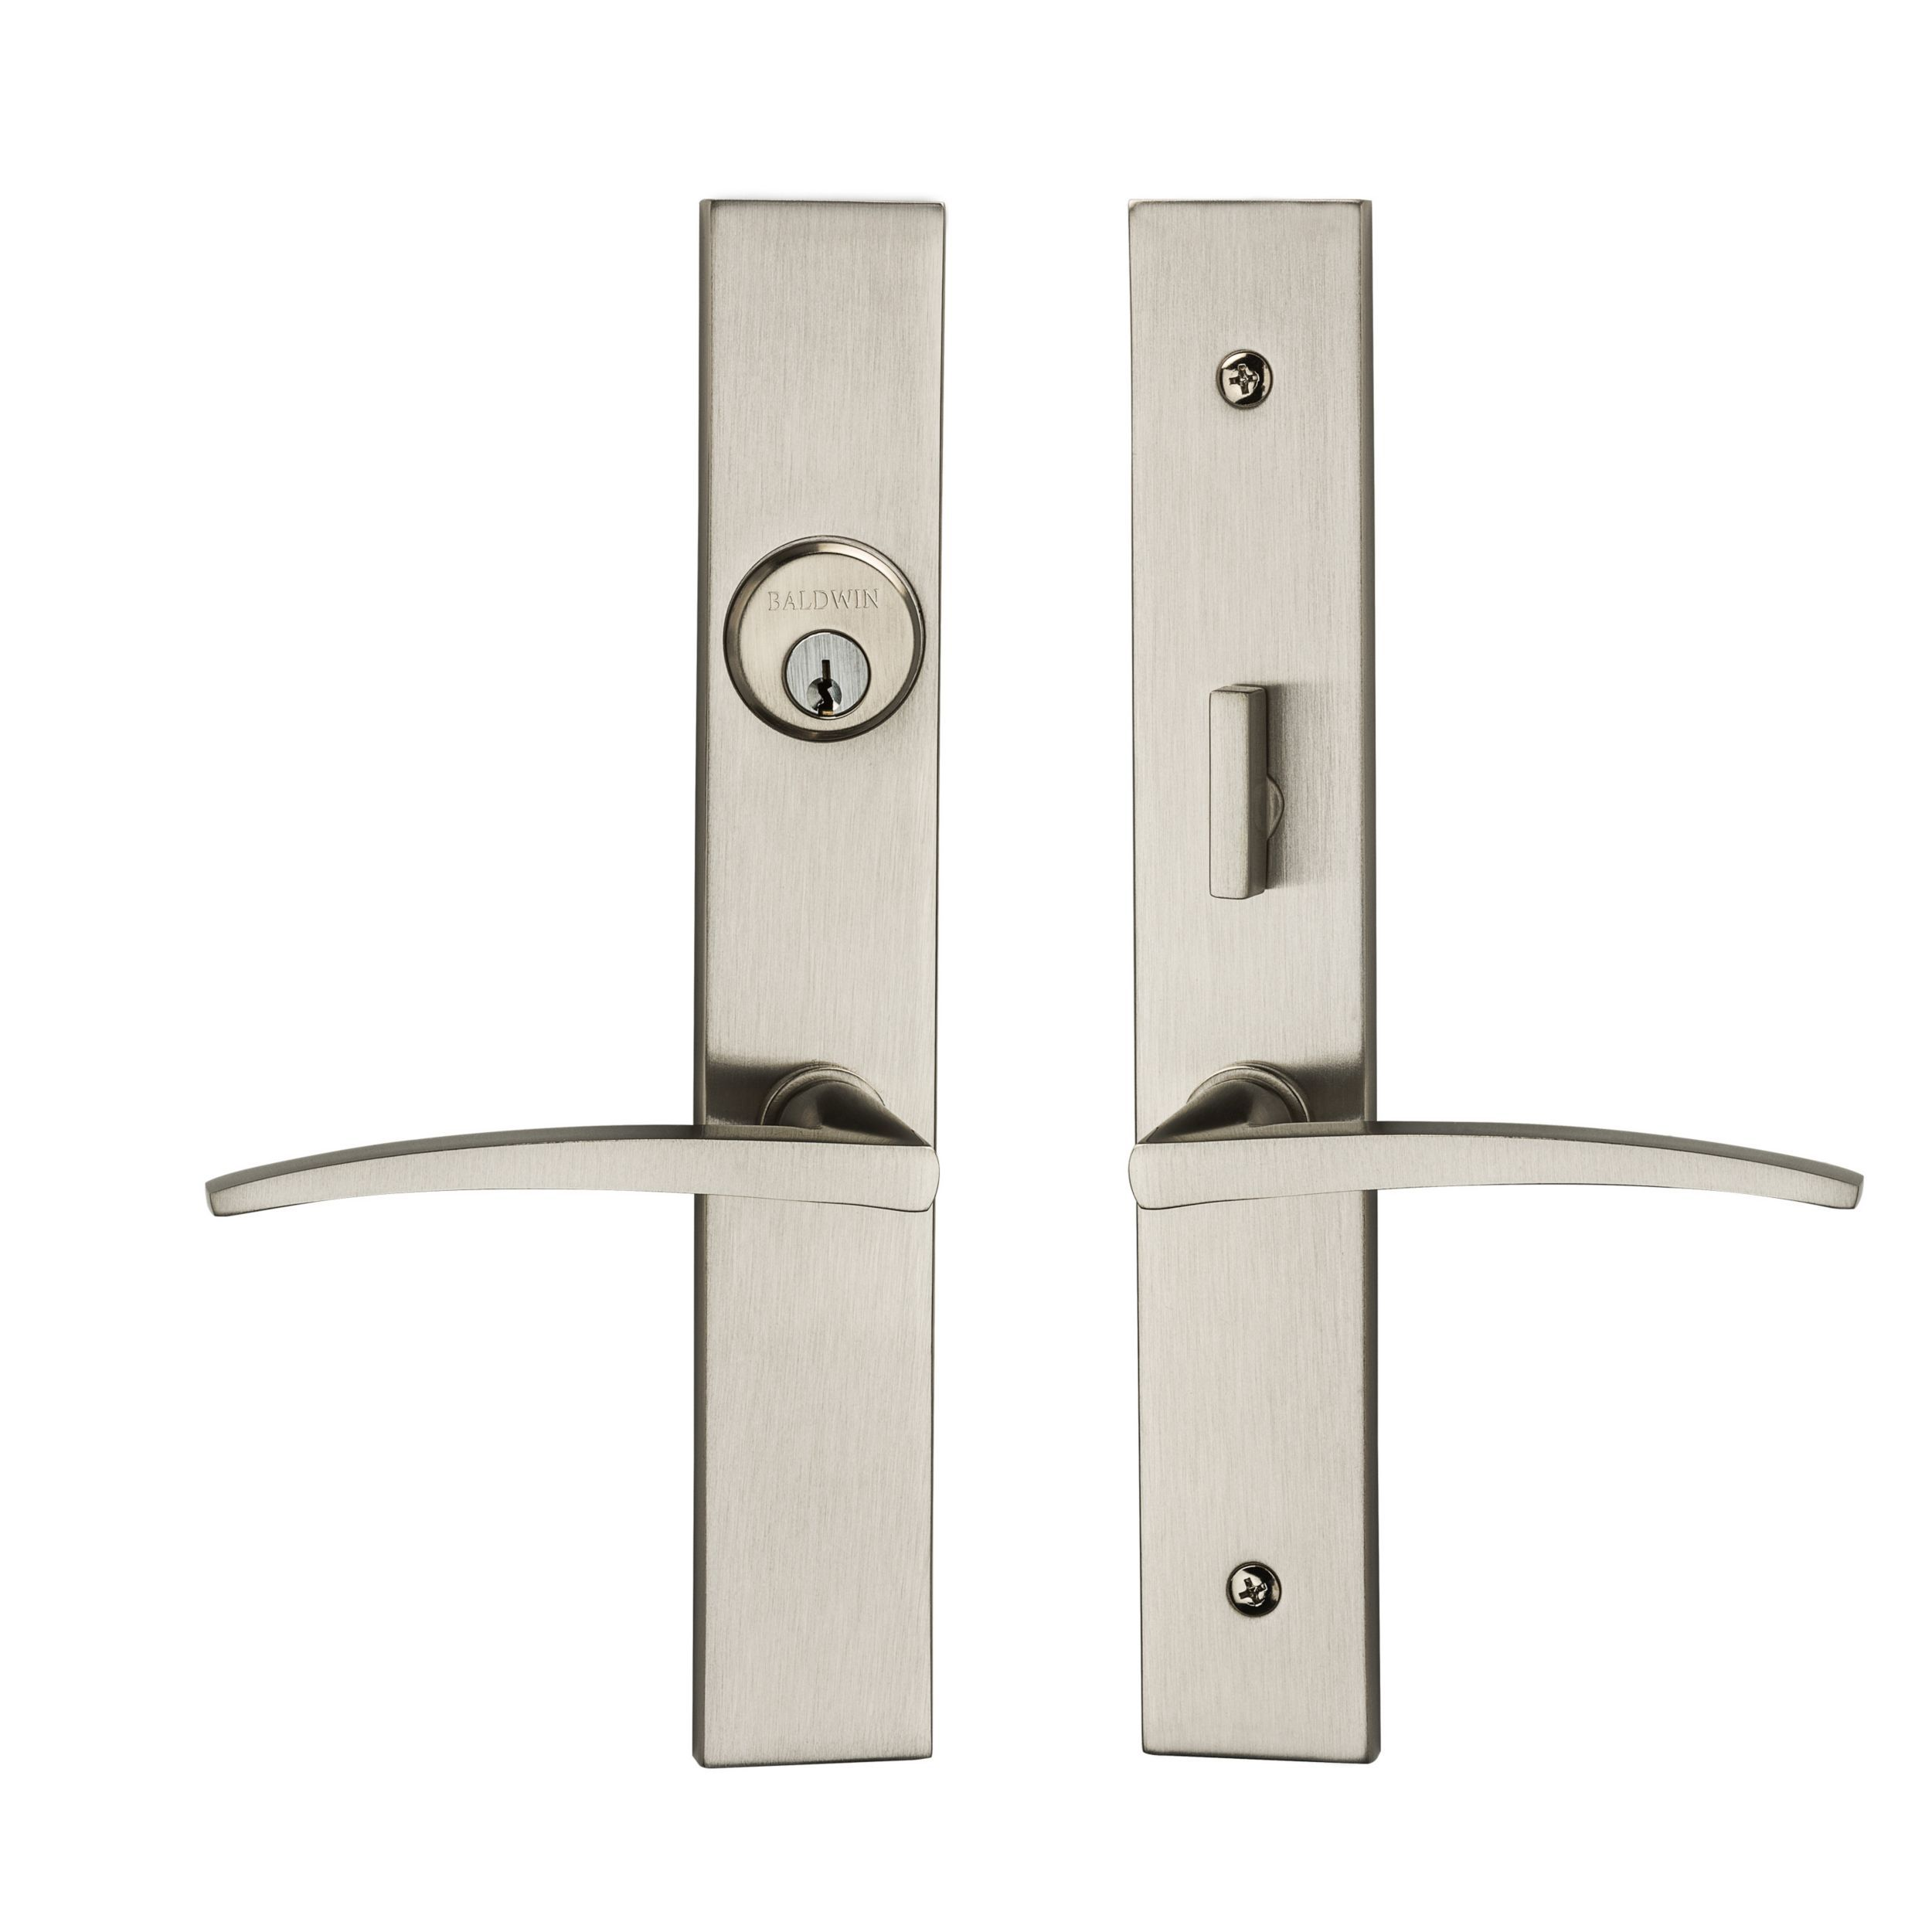 modern exterior door handles. Contemporary Design Modern Exterior Door Handles H